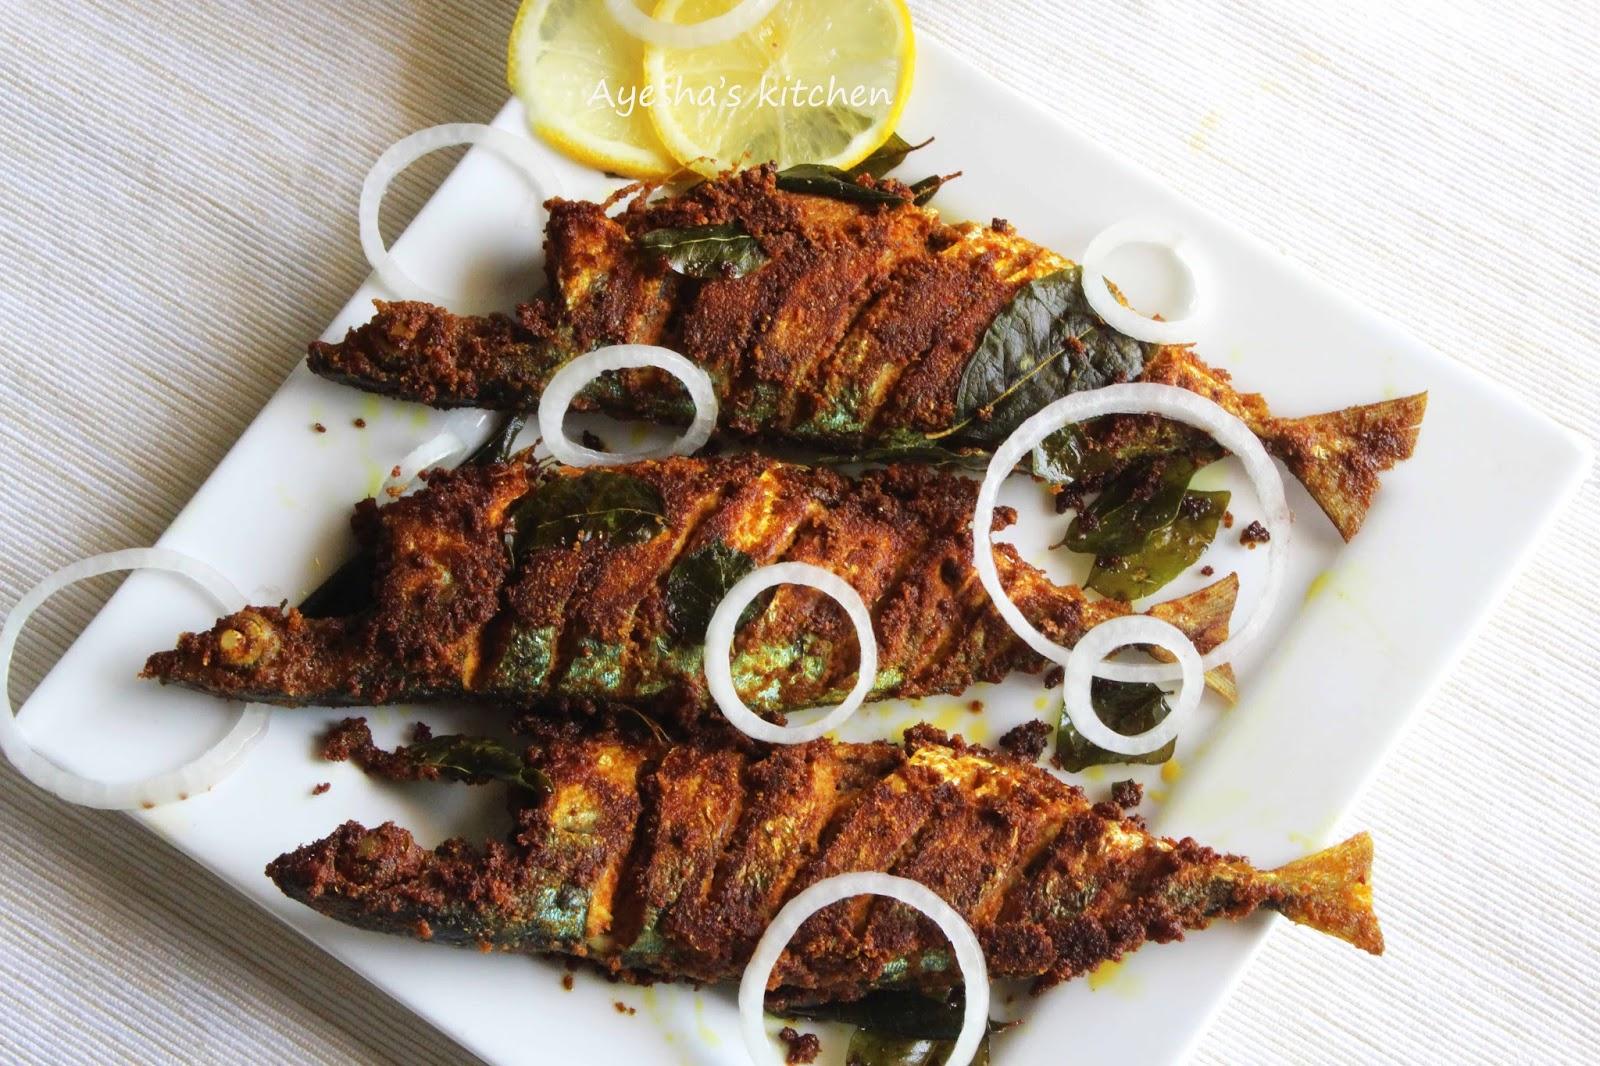 Fish fry recipe spicy mackerel ayala fry for Fish fry ingredients